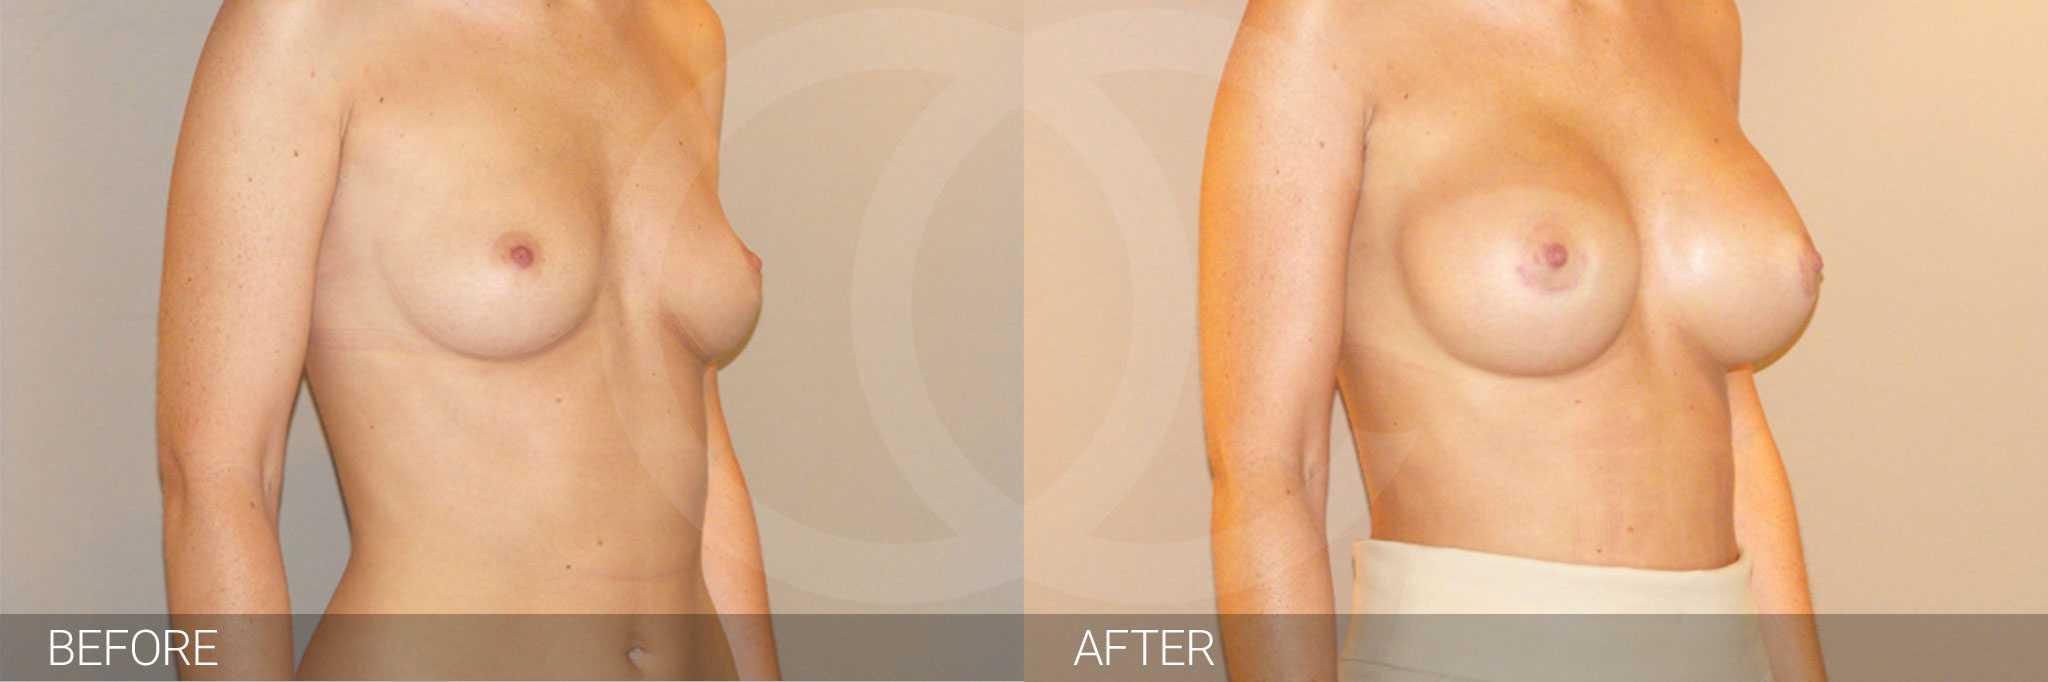 Augmentation mammaire Prothèses silicone position sous-glandulaire ante/post-op II